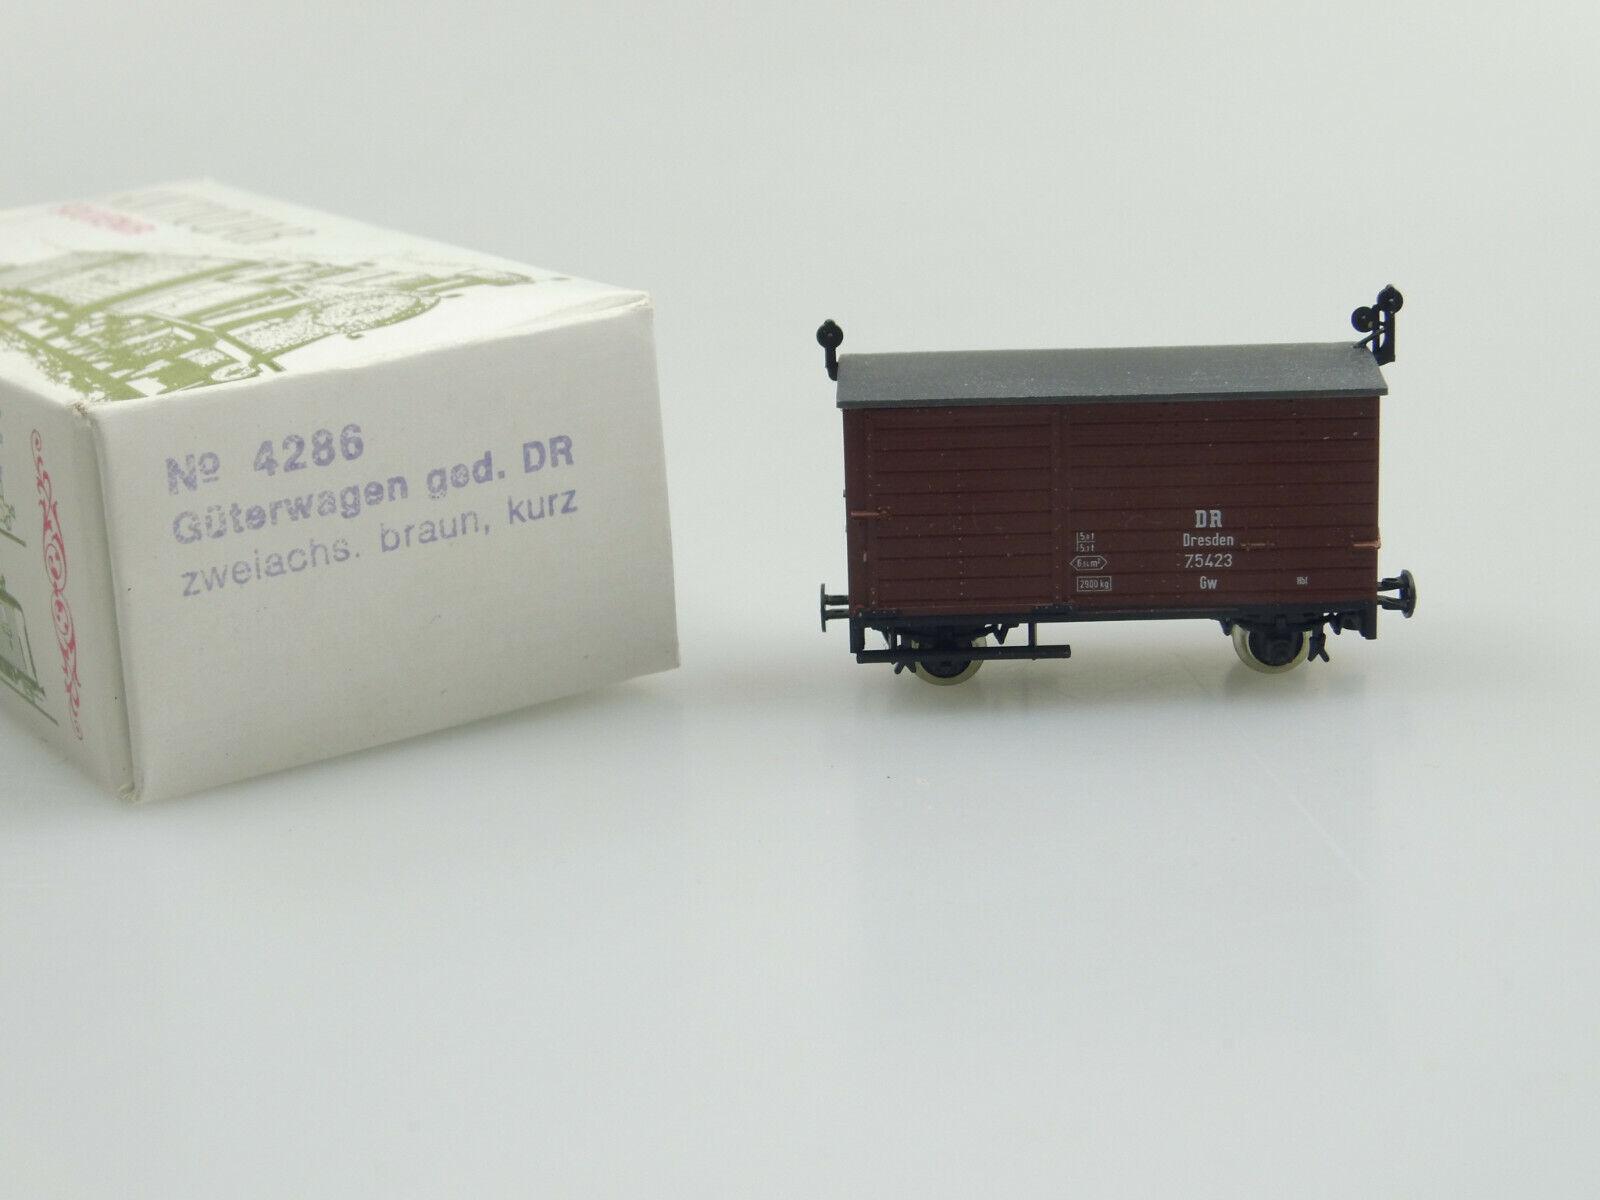 Techno modello h0e 4286 festa CARRO MERCI DR OVP